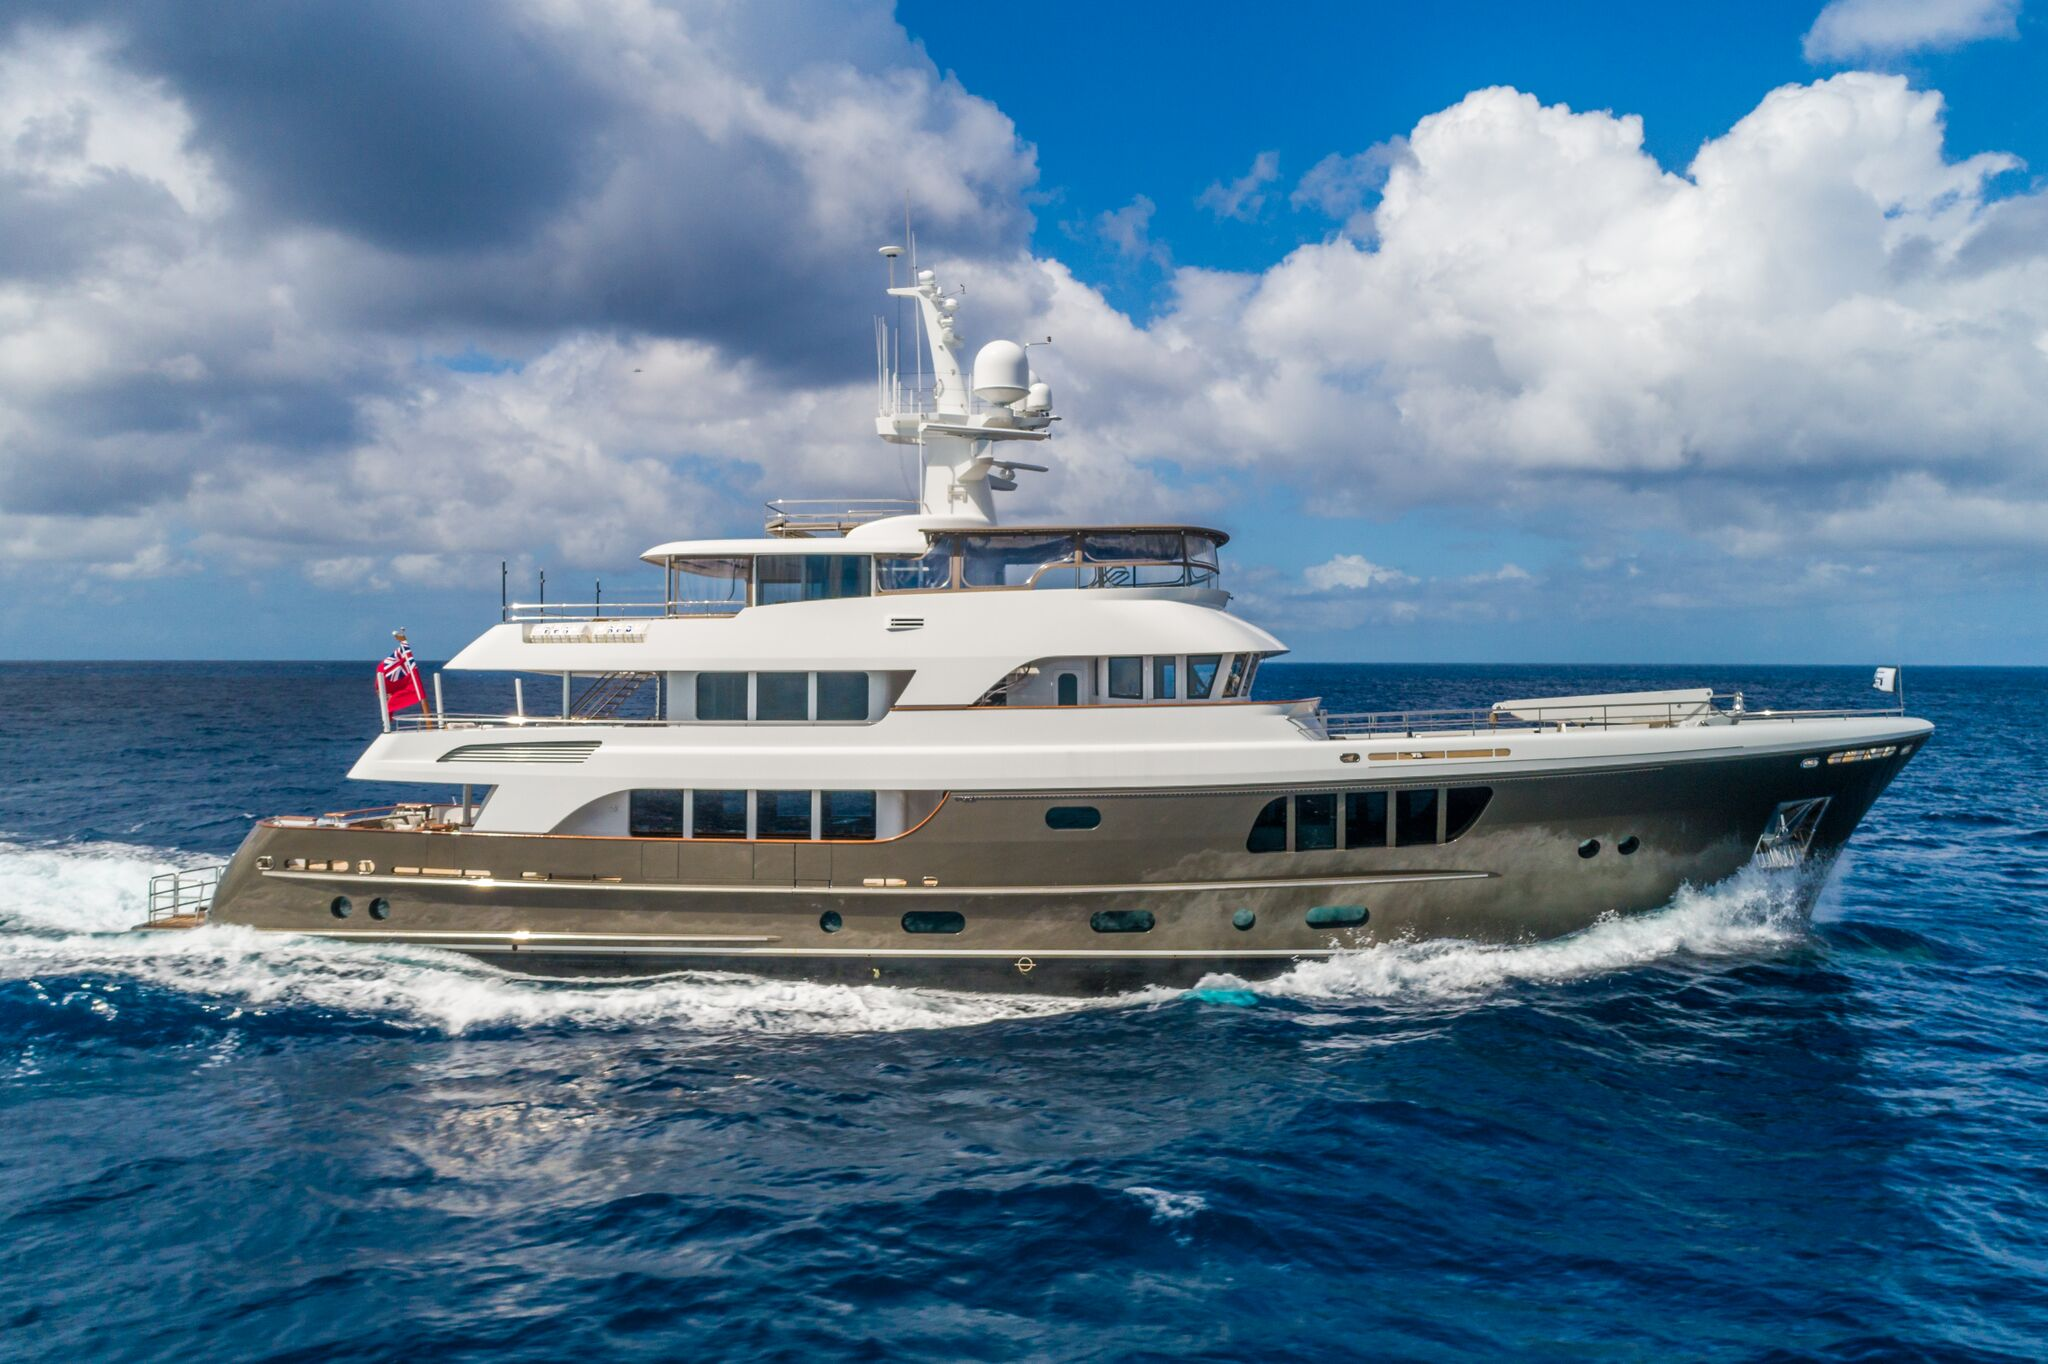 CARYALI 135′ Luxury Yacht For Sale